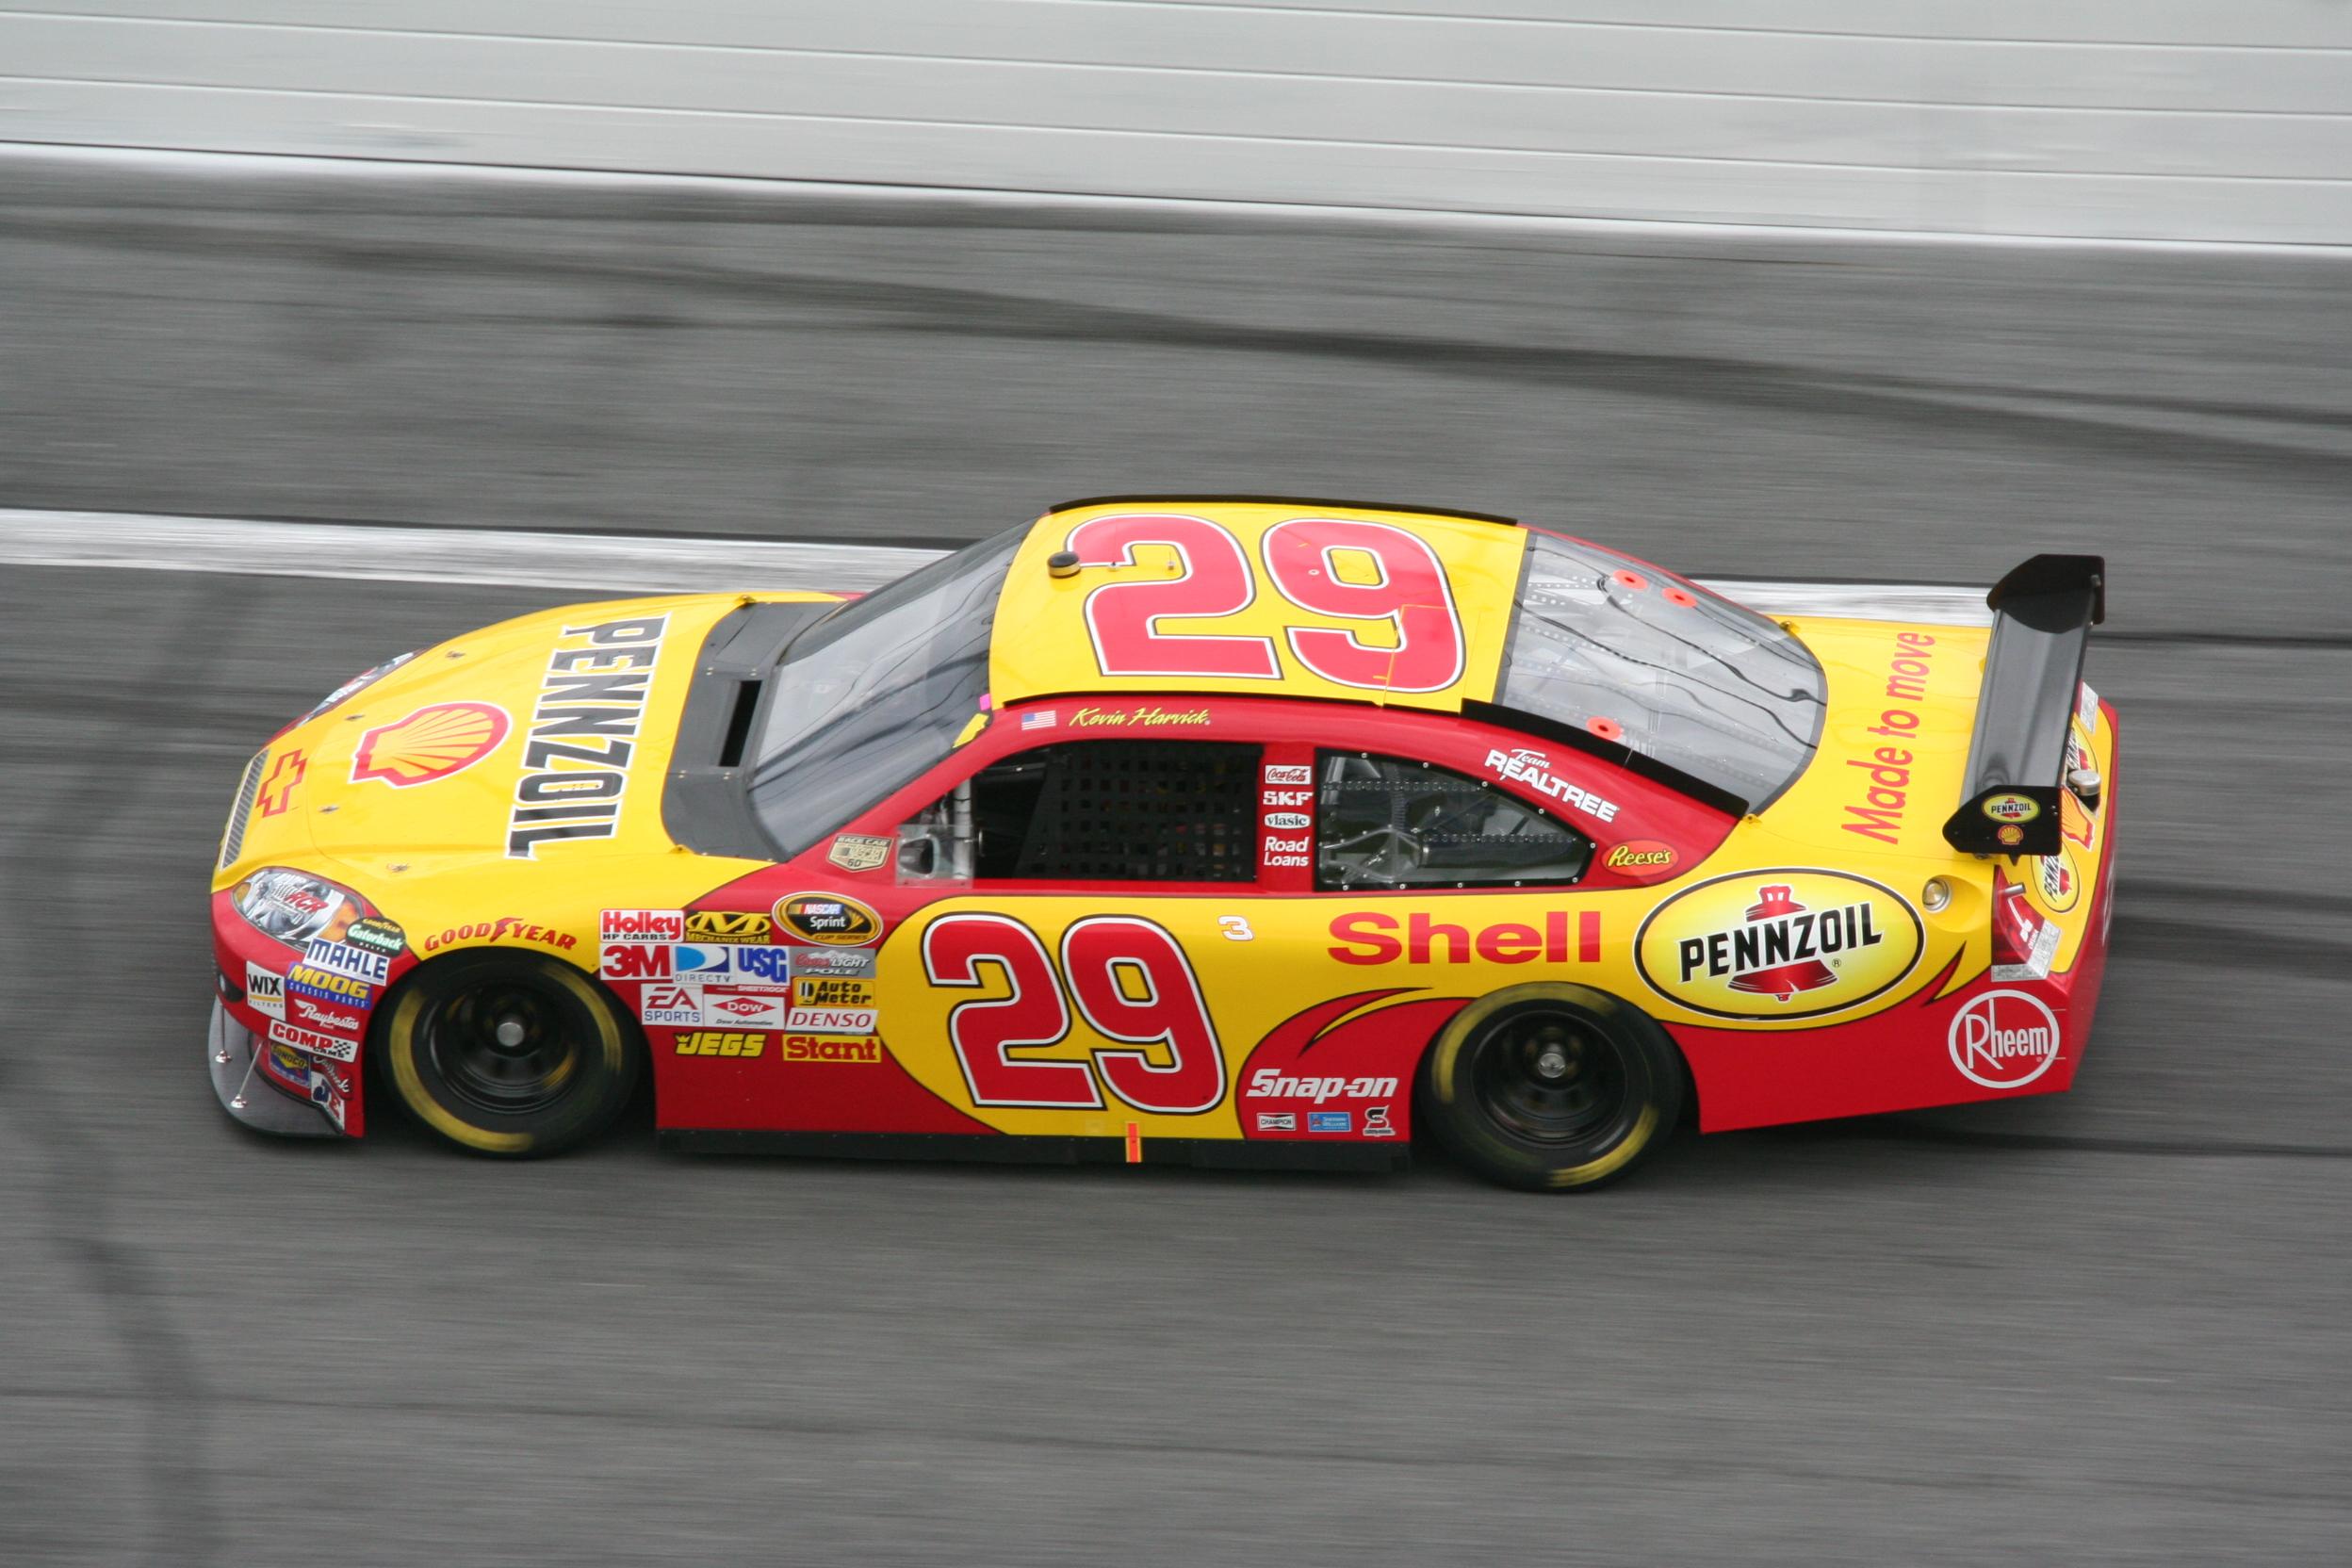 Race Car Sponsorship Agreement